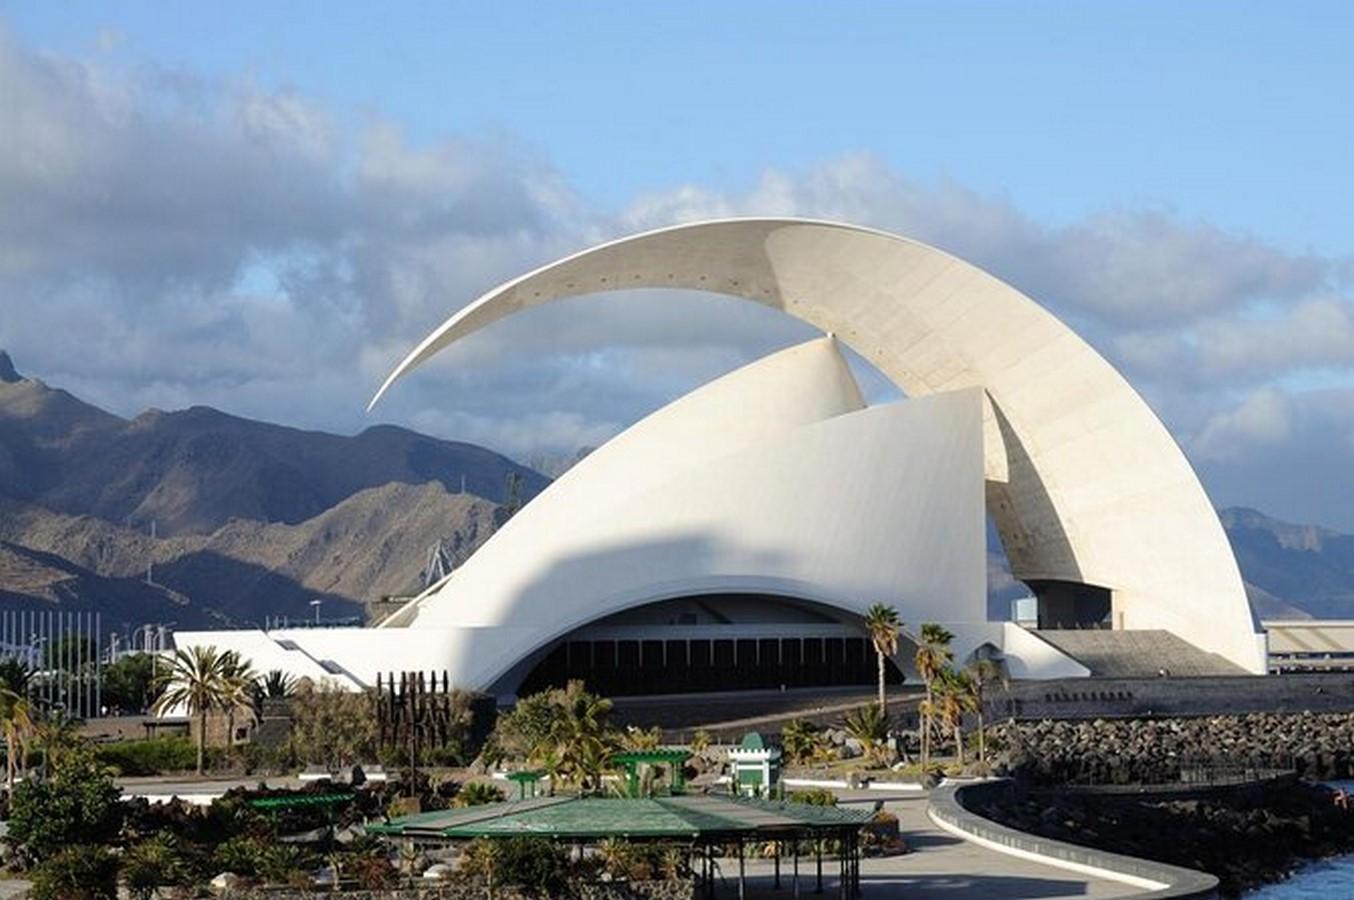 Auditorio de Tenerife Adán Martín by Santiago Calatrava: The great Arc - Sheet1